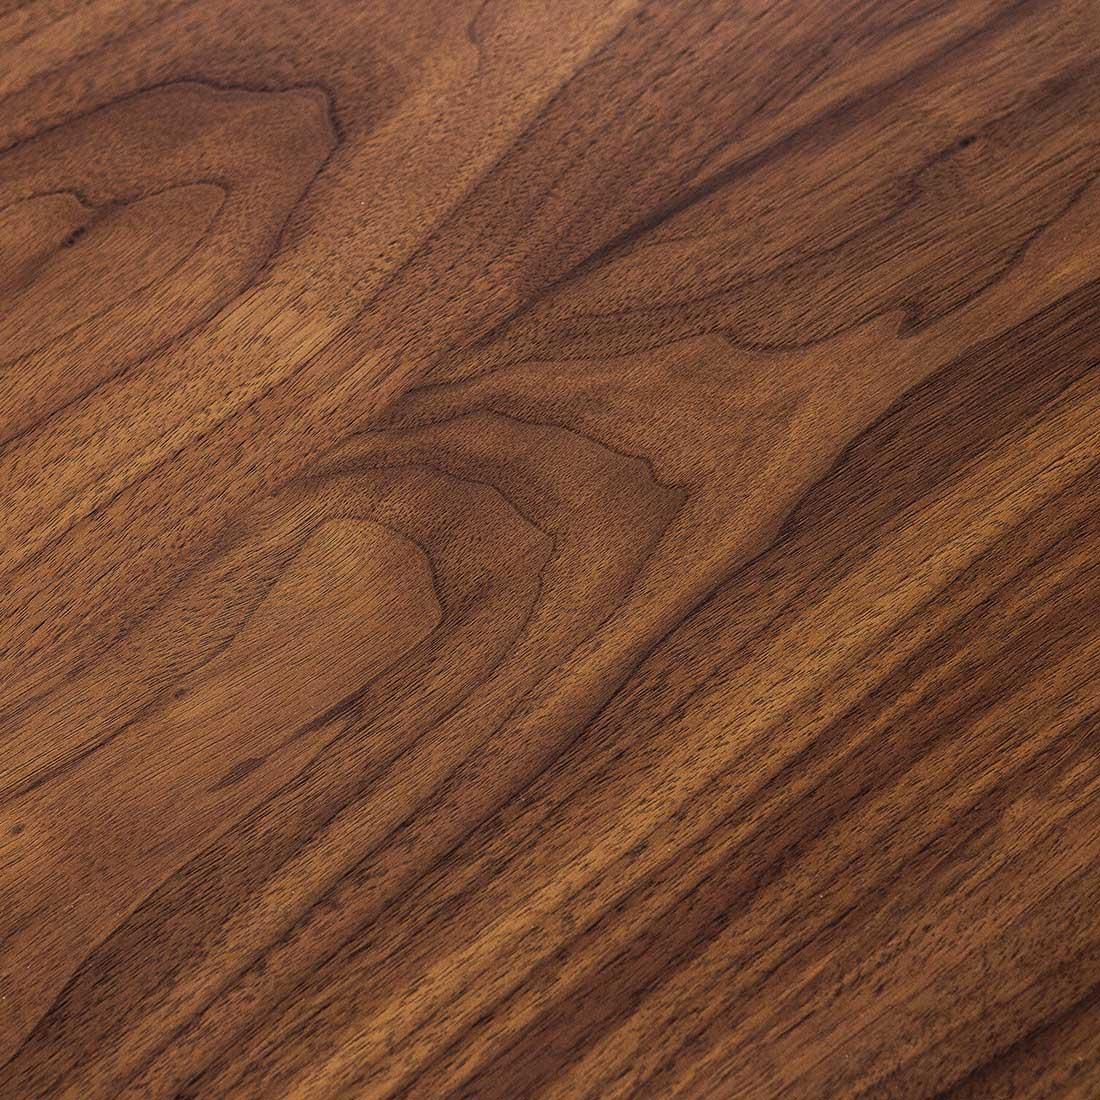 Texture bois marron